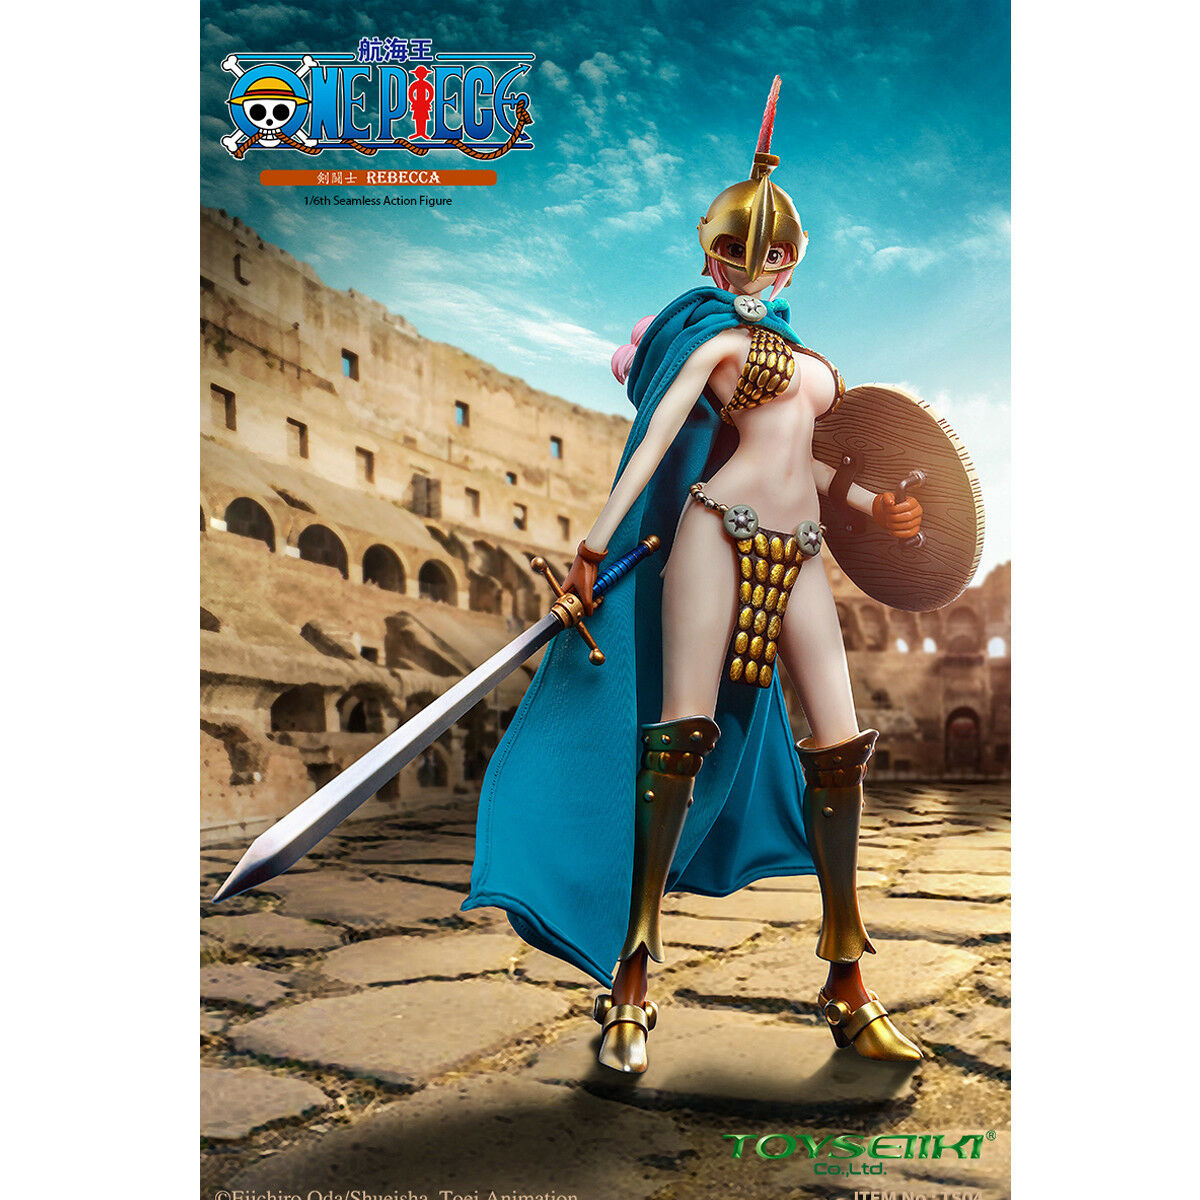 TOYSEIIKI 1 6 Scale ONE PIECE Gladiator Rebecca Action Figure